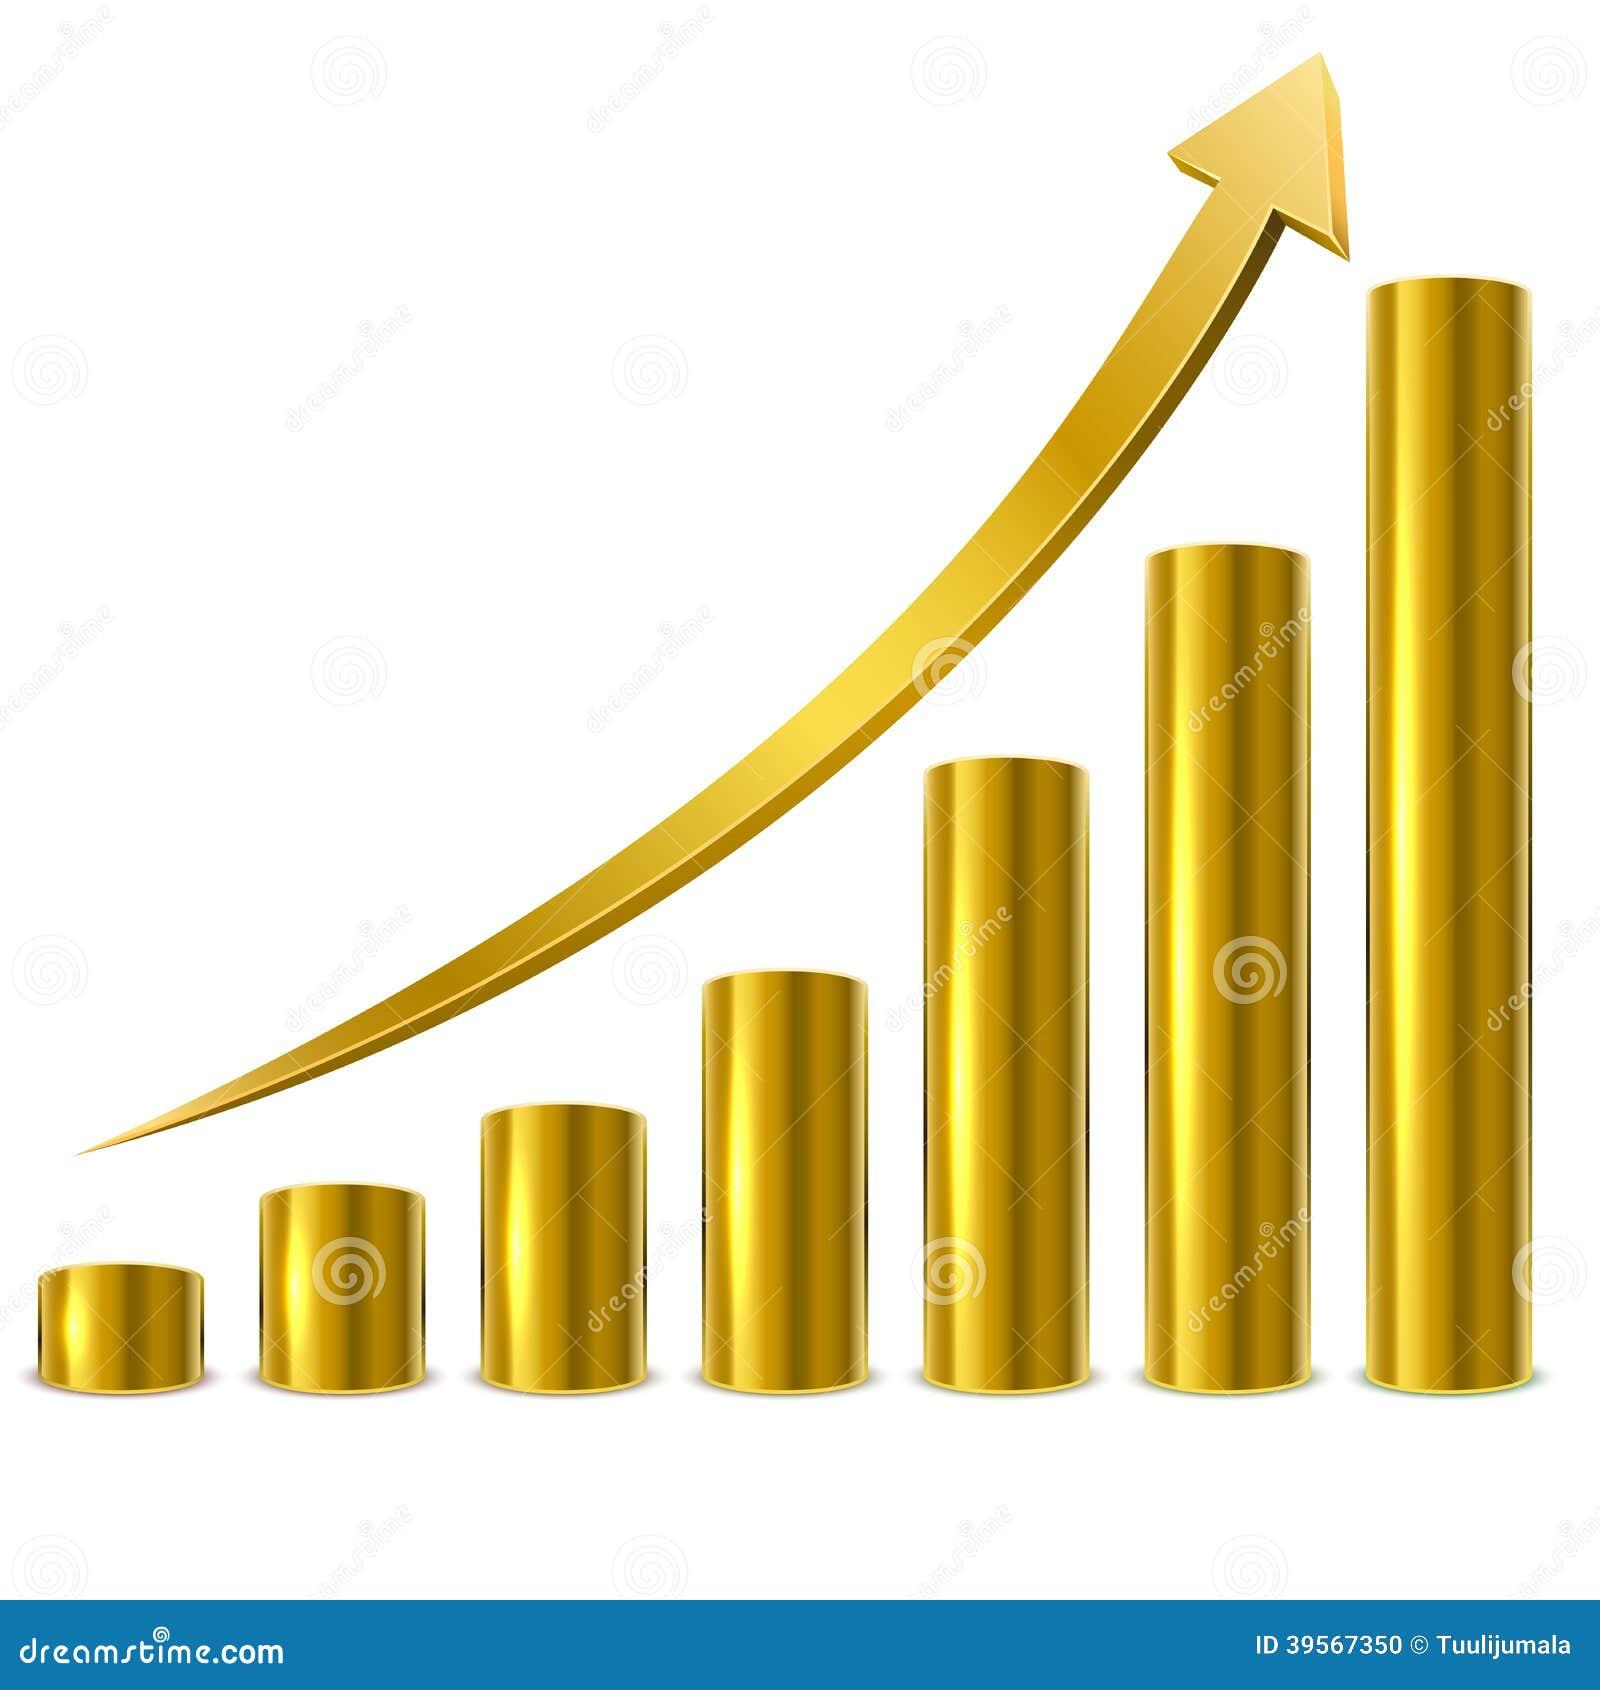 golden graph bars stock vector illustration of cylinder 39567350